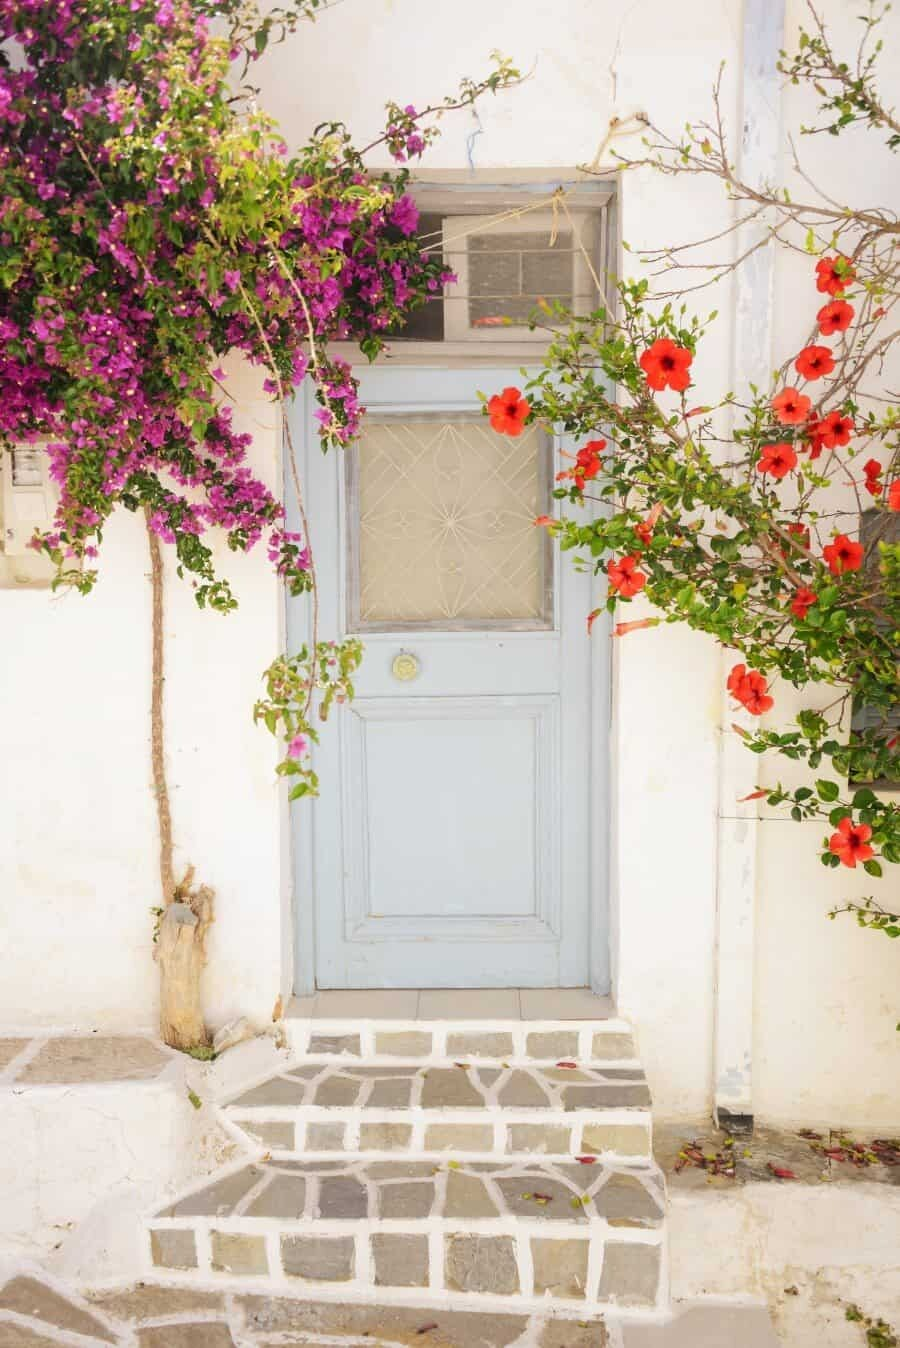 paros-island-greek-islands-by-the-wandering-lens-10